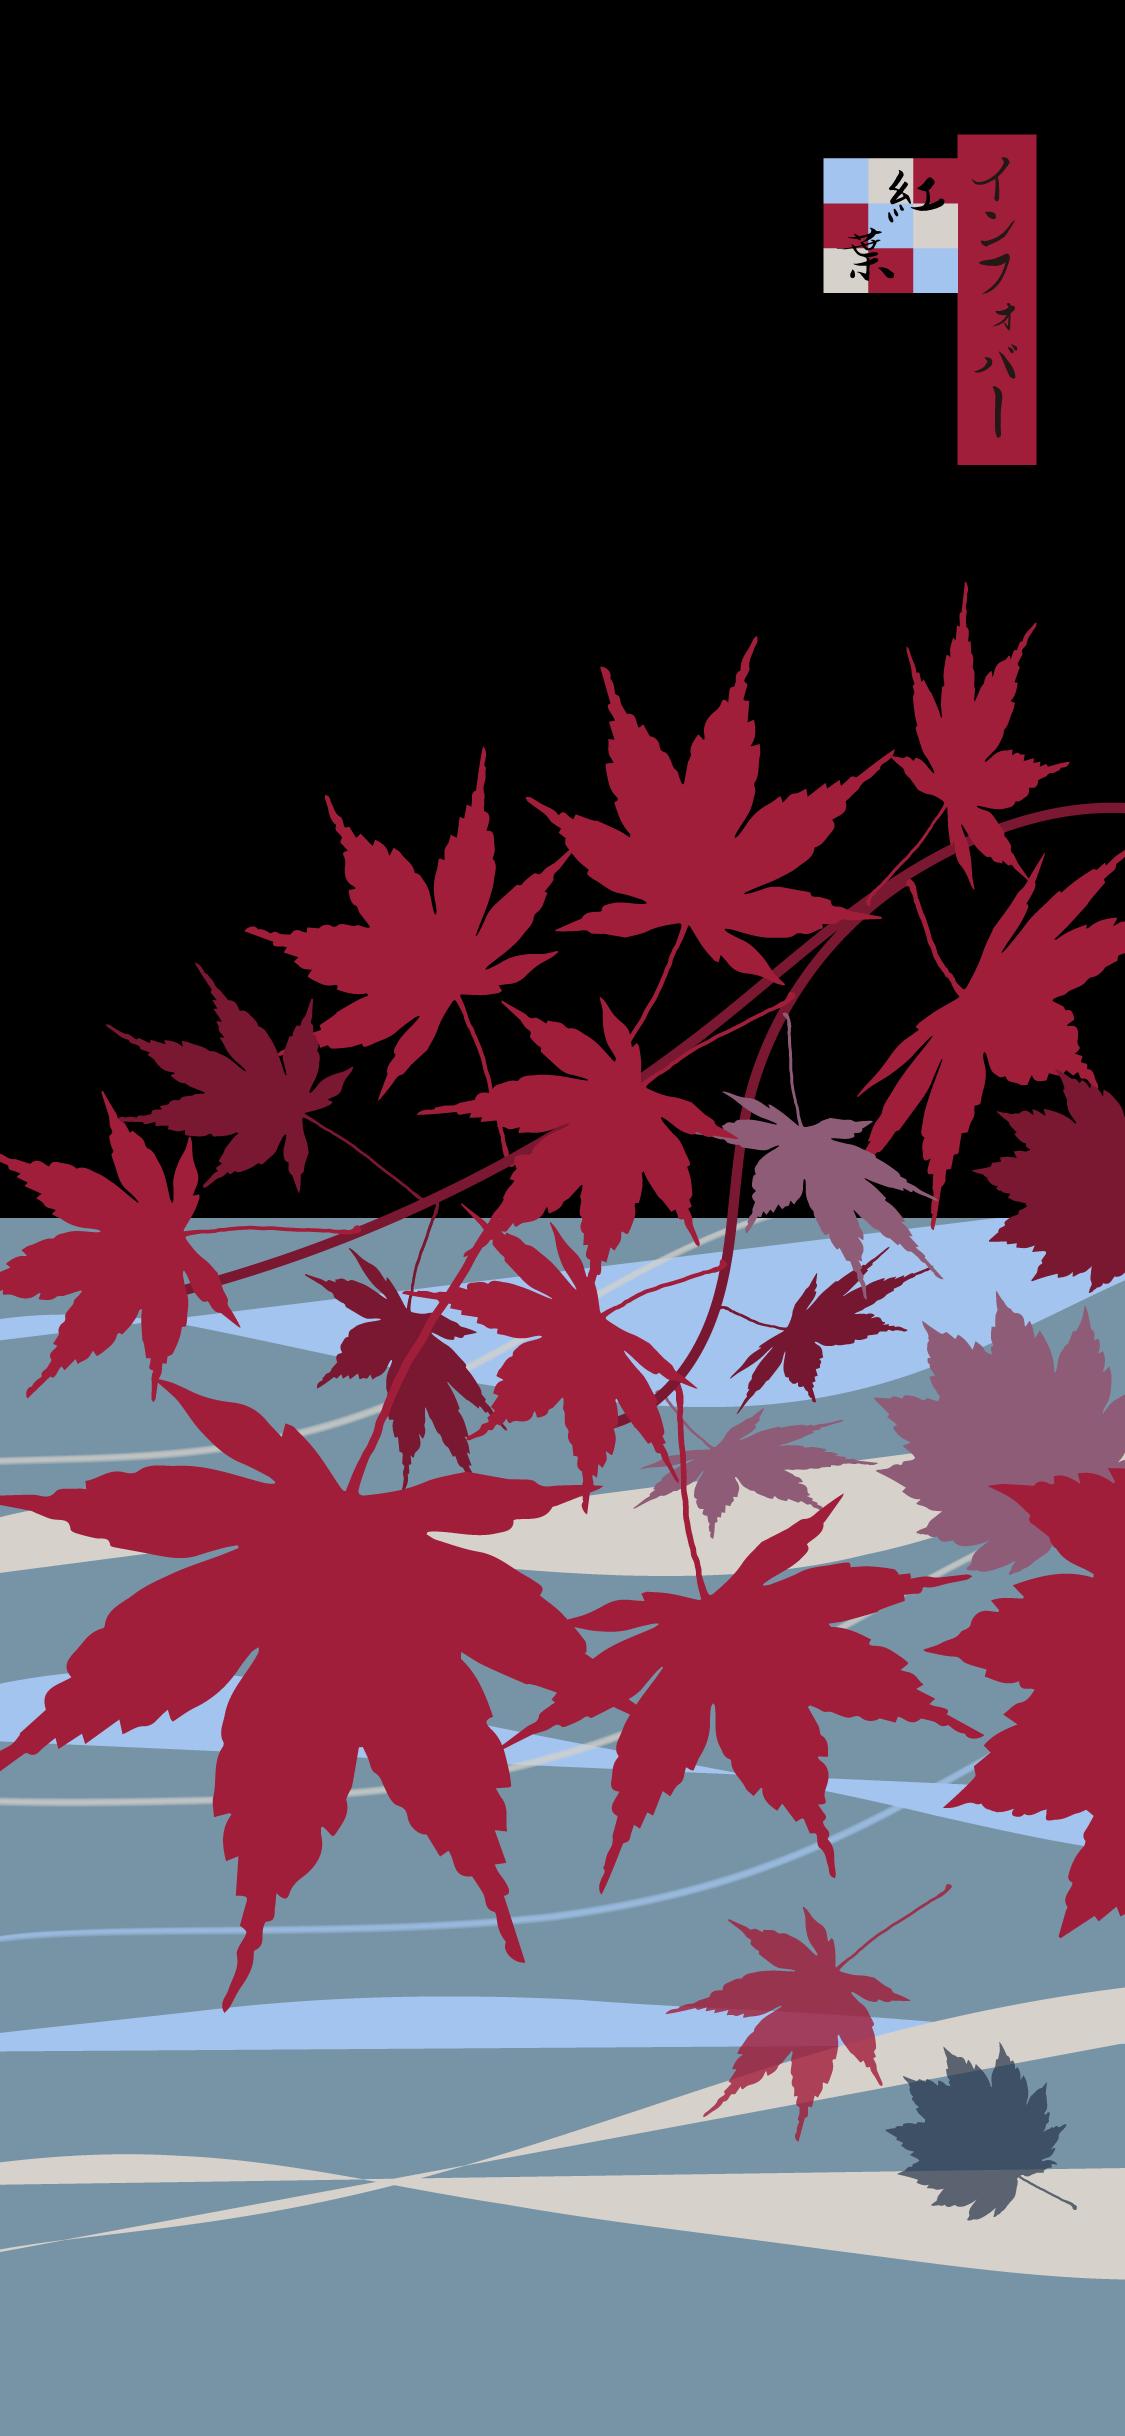 iPhone X, Xs, XR, 11, 11 Pro用壁紙 | 紅葉(夜)(1125x2436)